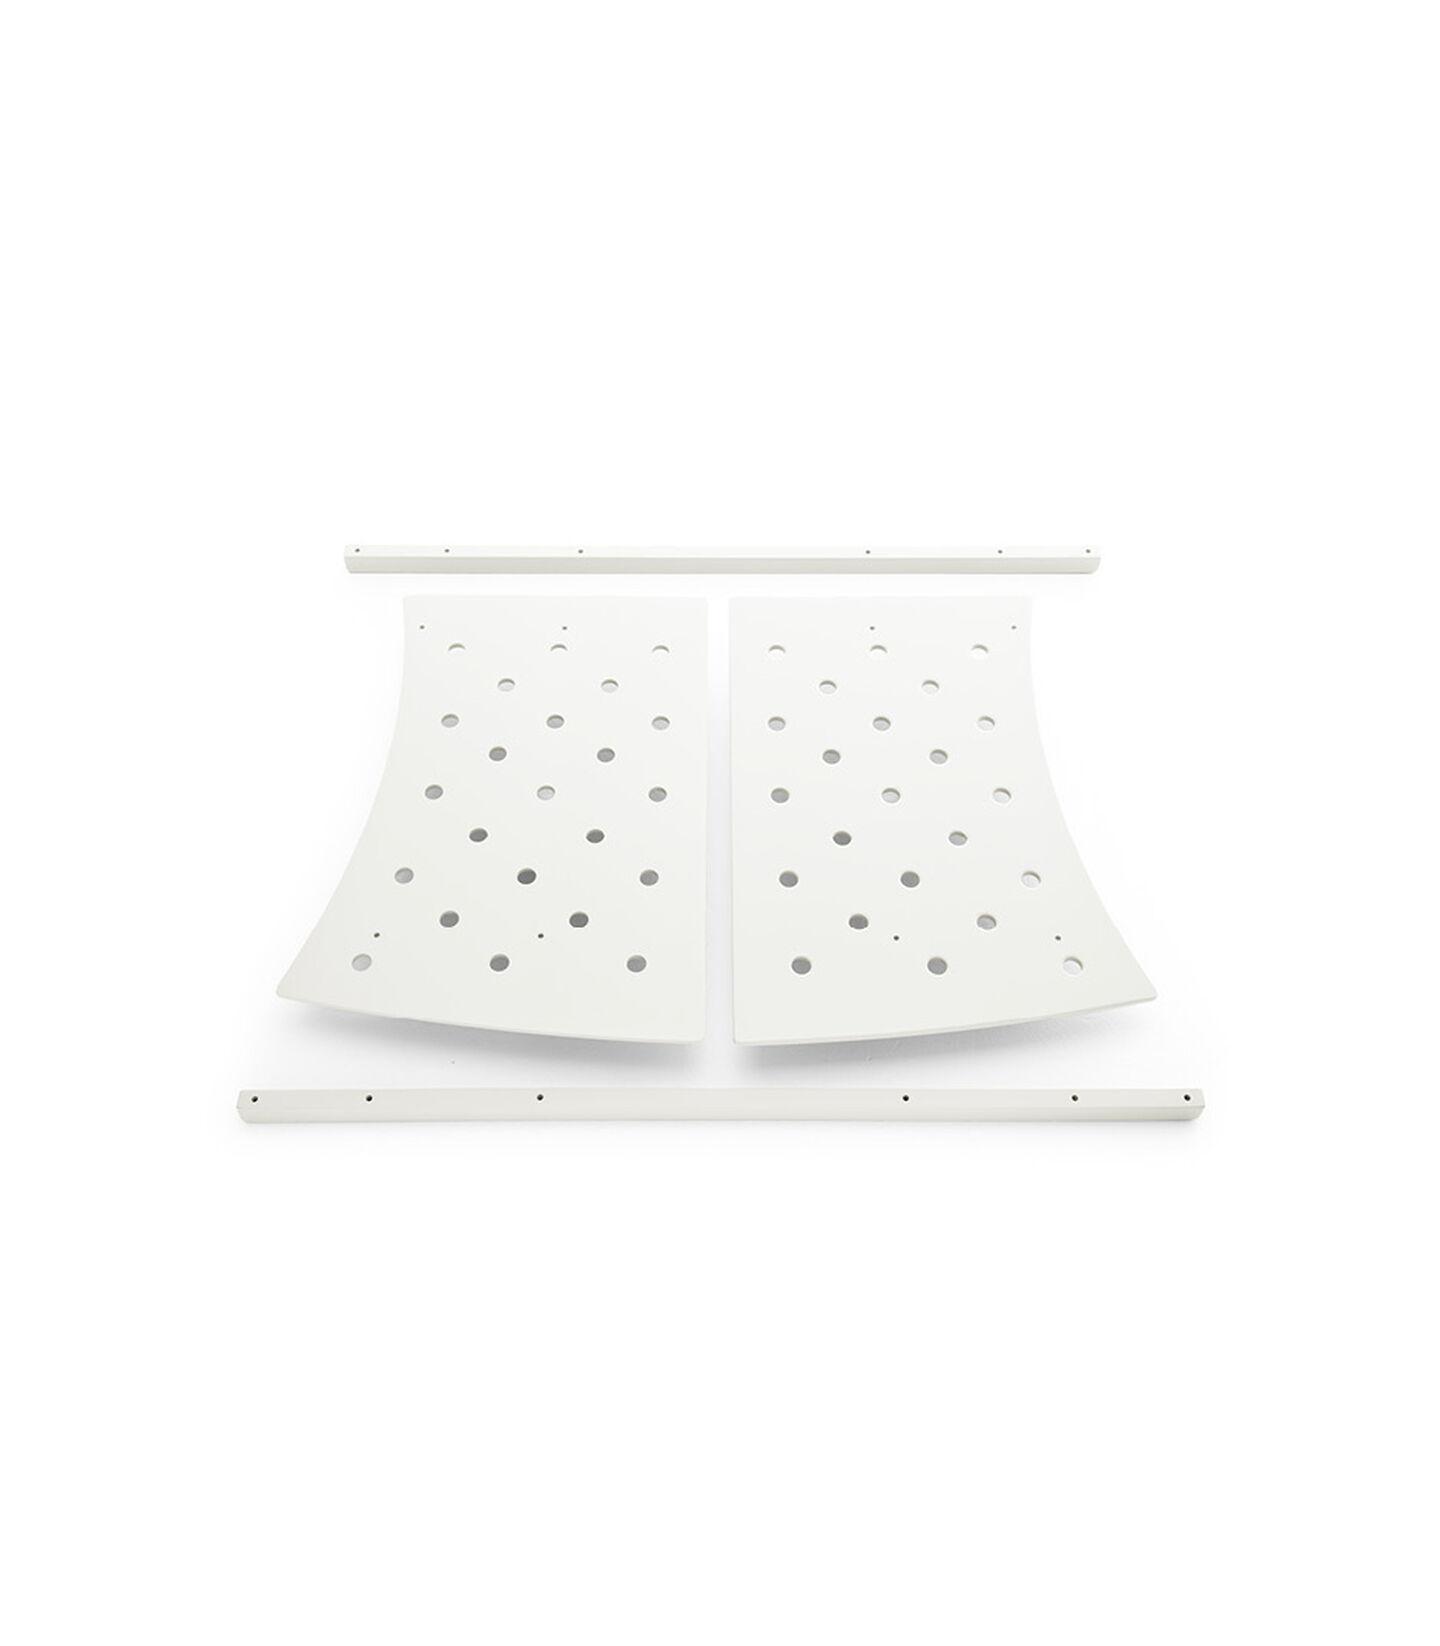 Stokke® Sleepi™ Junior Extension Blanco, Blanco, mainview view 2